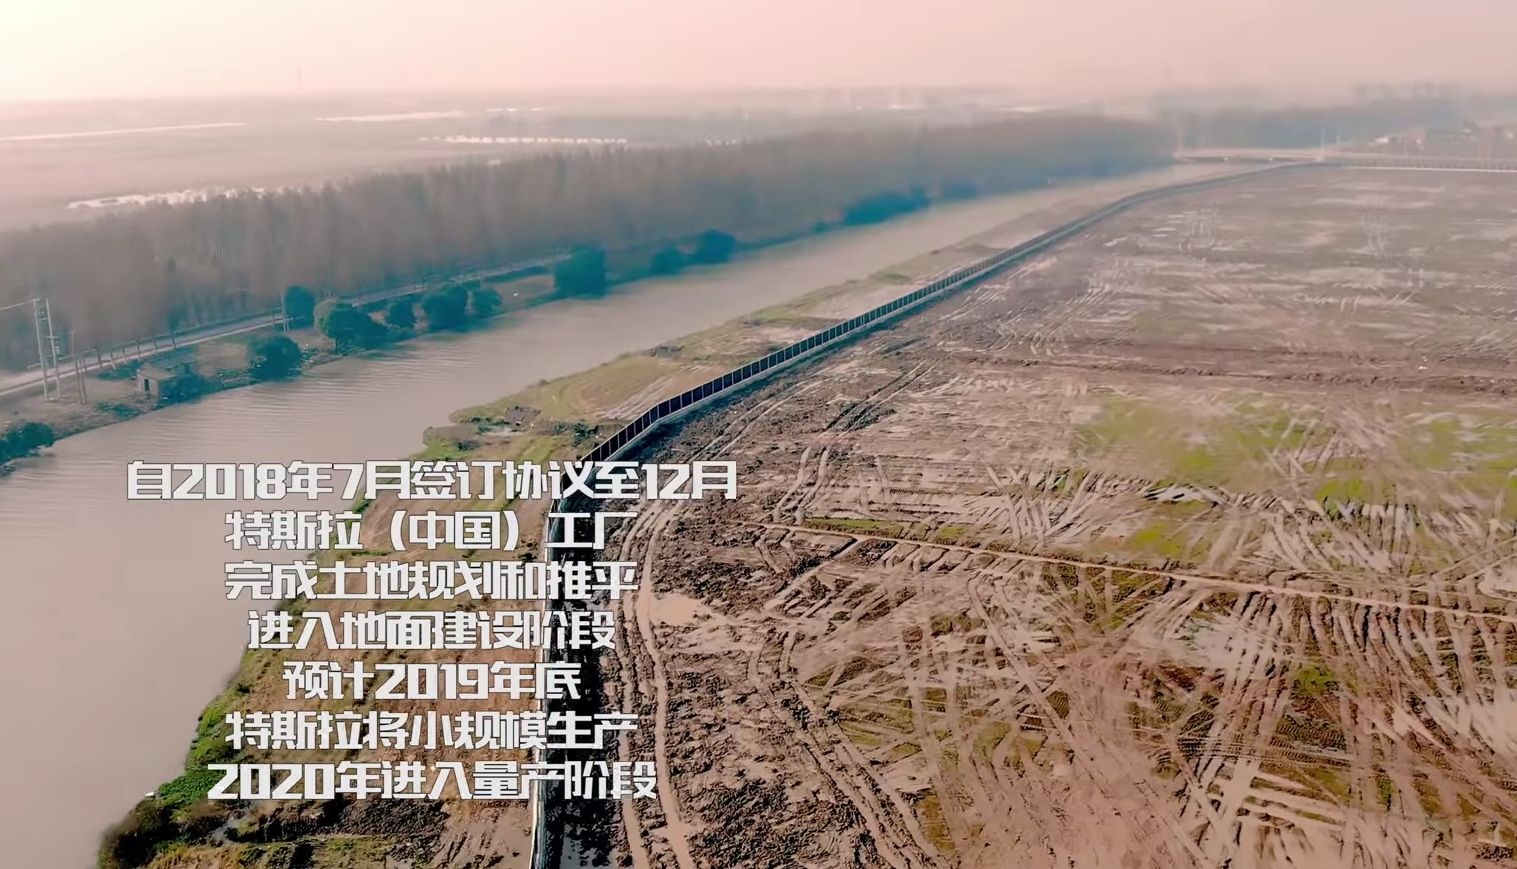 shanghai-gigafactory